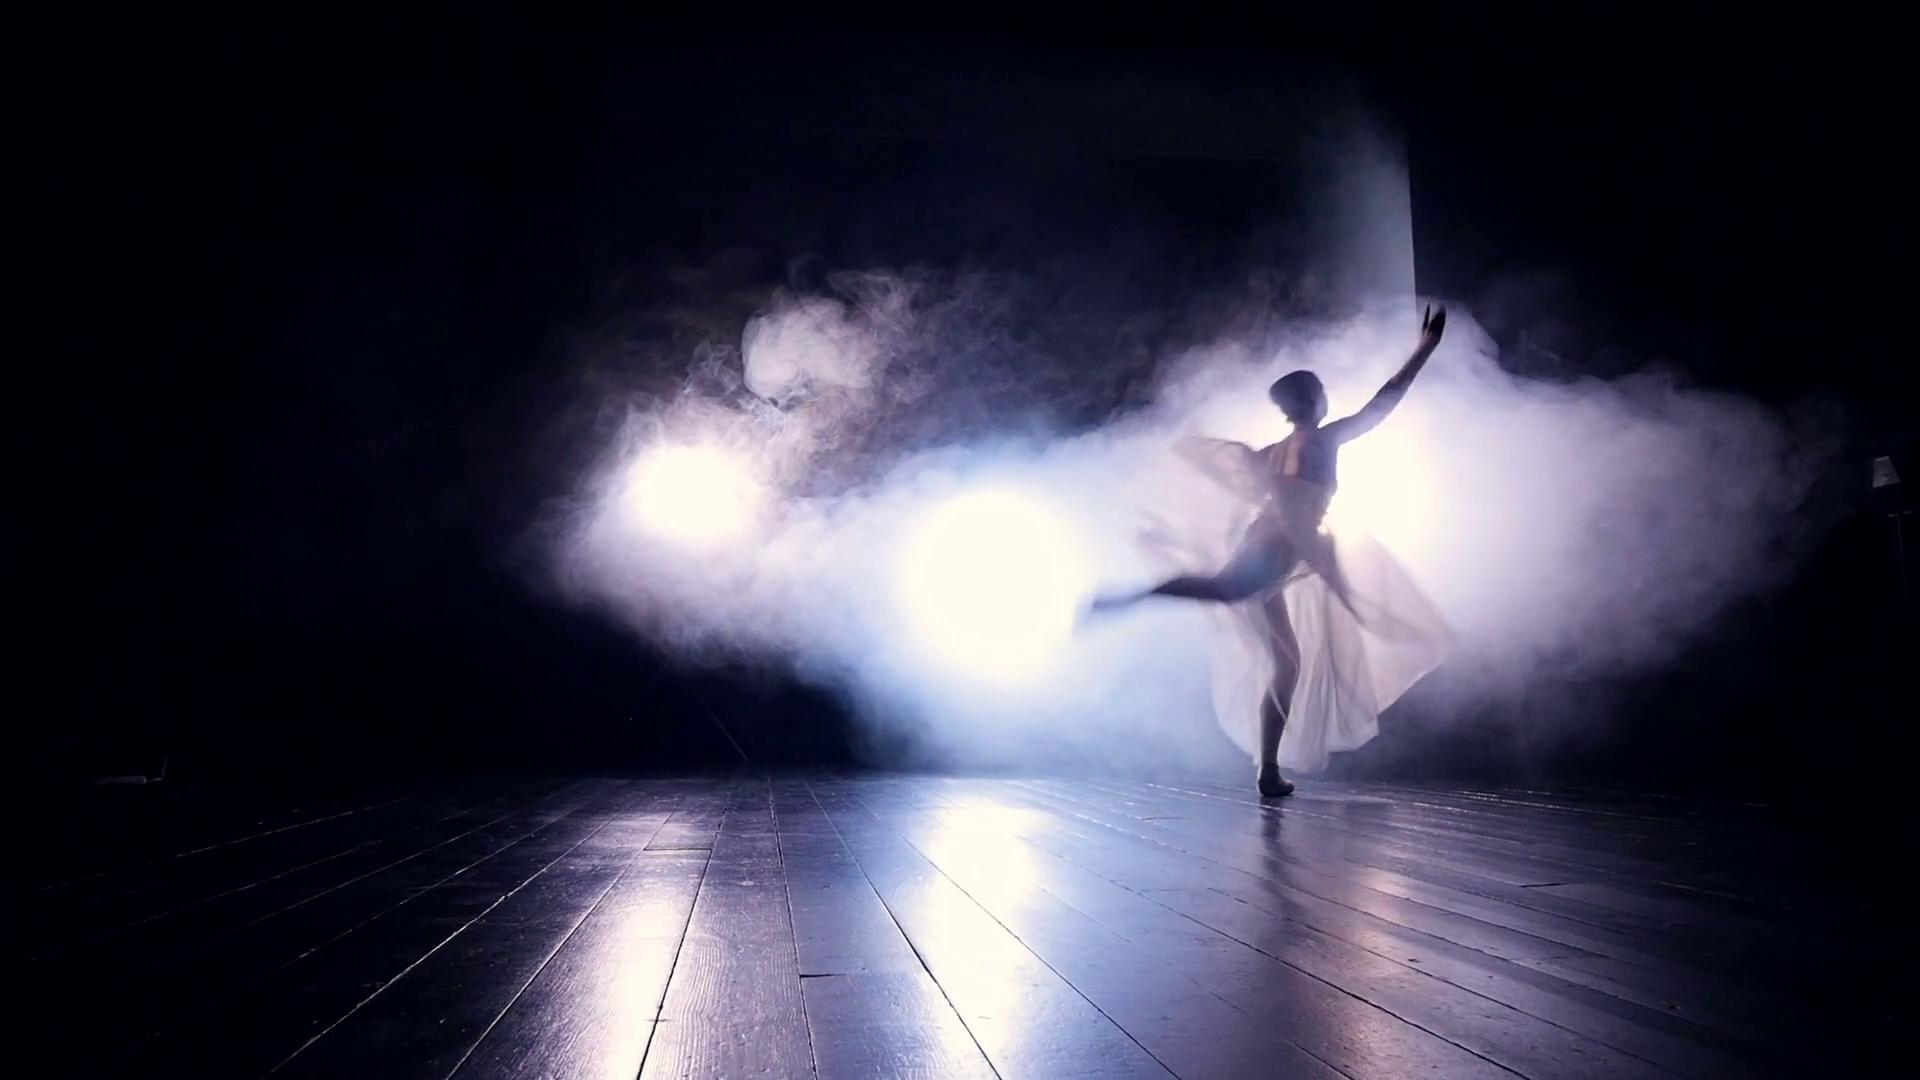 Ballet Dancer Wallpaper Hd Posted By Michelle Mercado